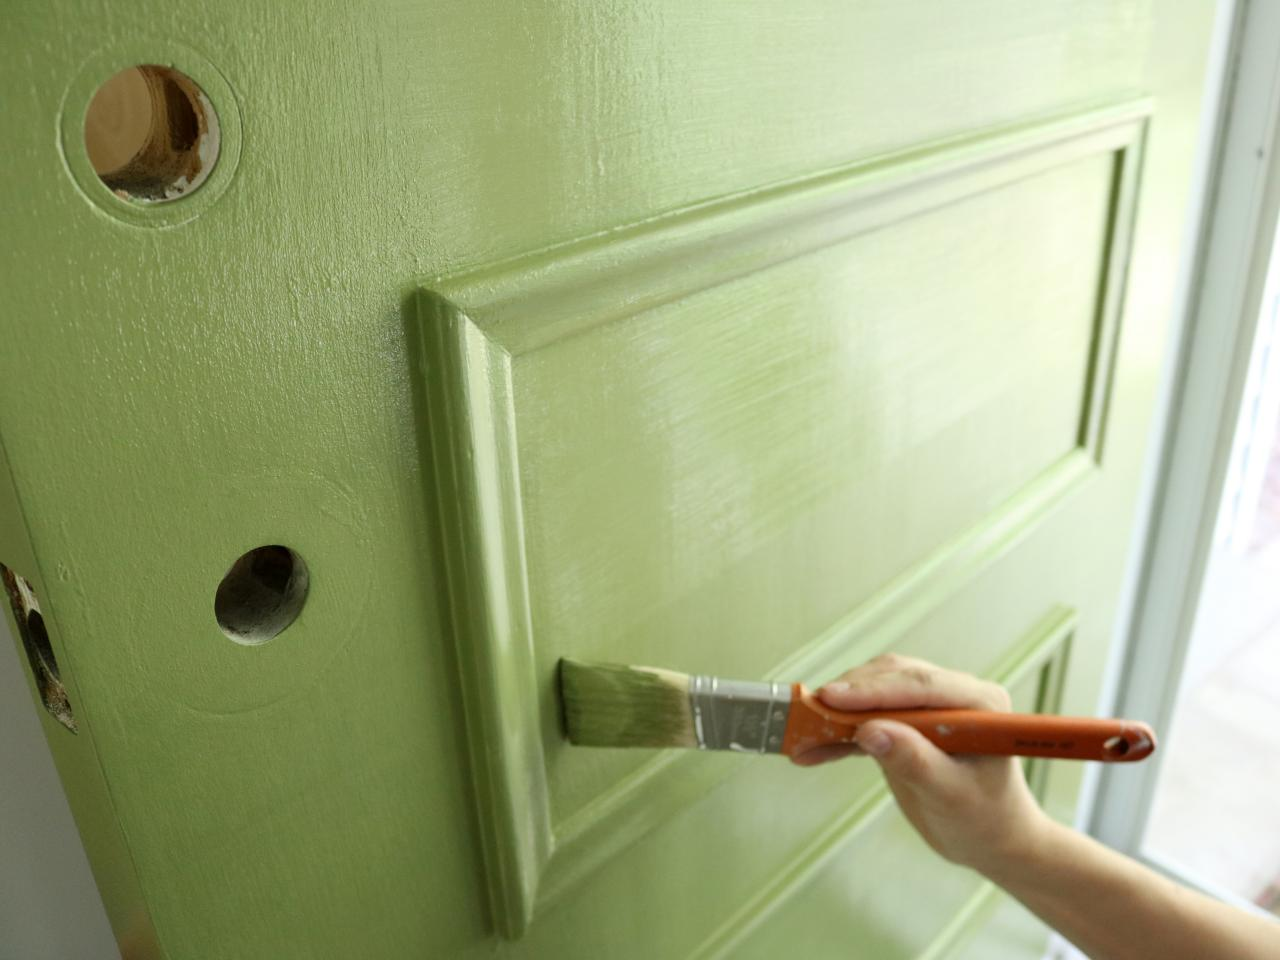 Learn How to Paint Your Front Door | how-tos | DIY